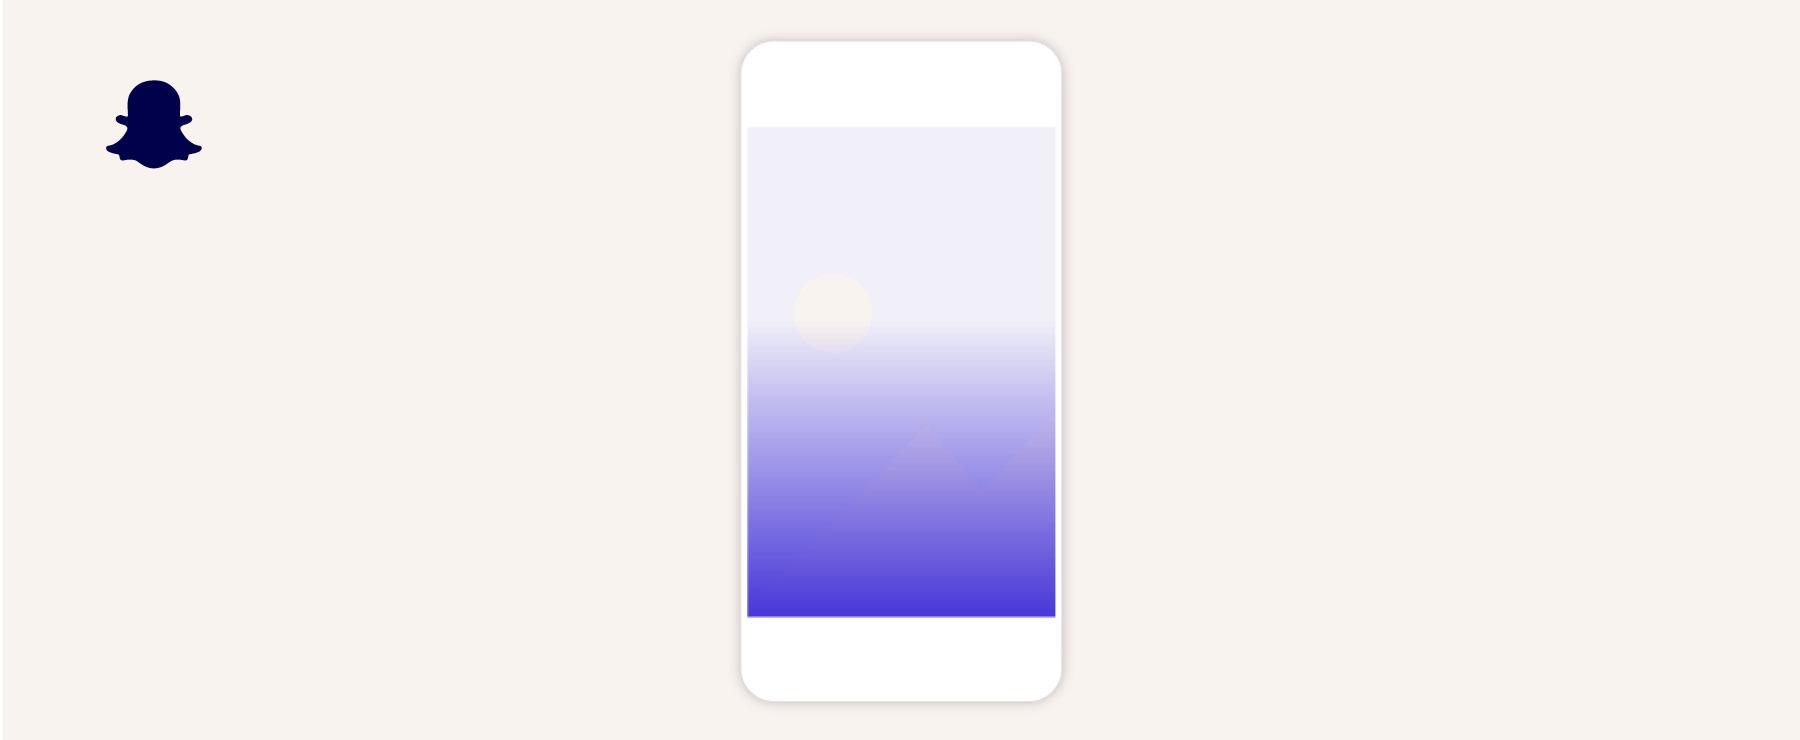 Snapchat standard image & video length